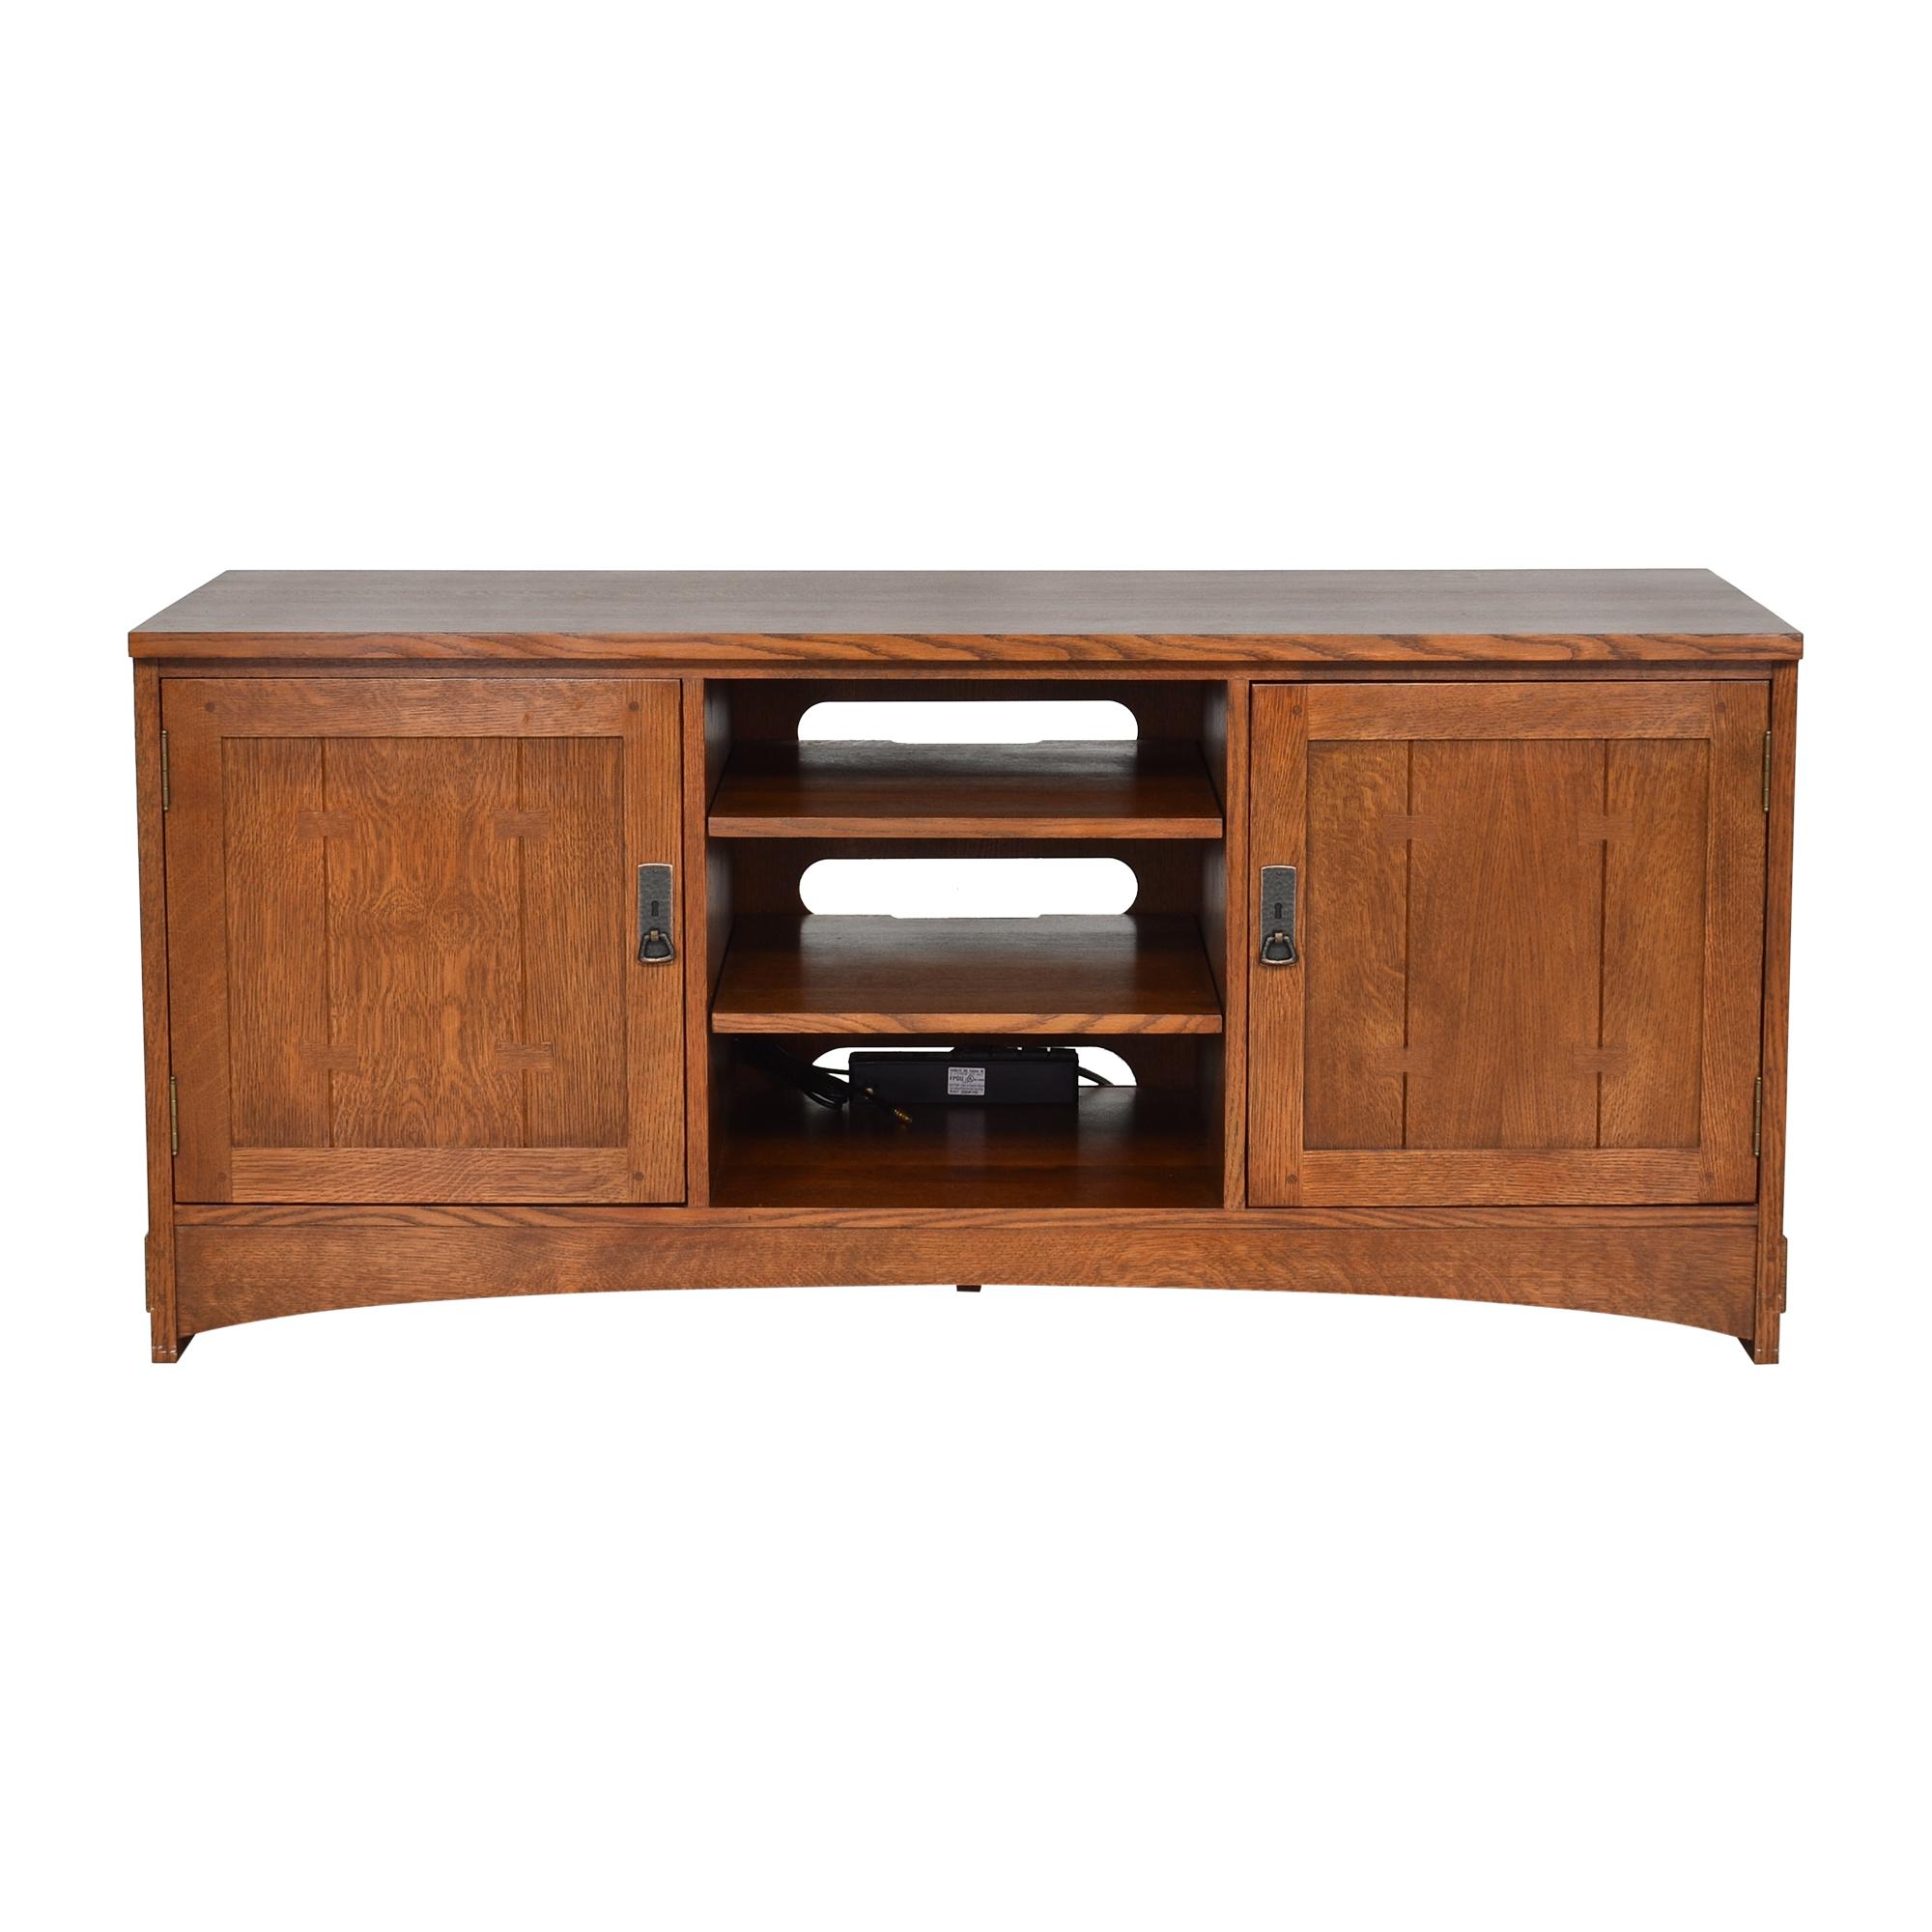 Stickley Furniture Mission Media Console sale